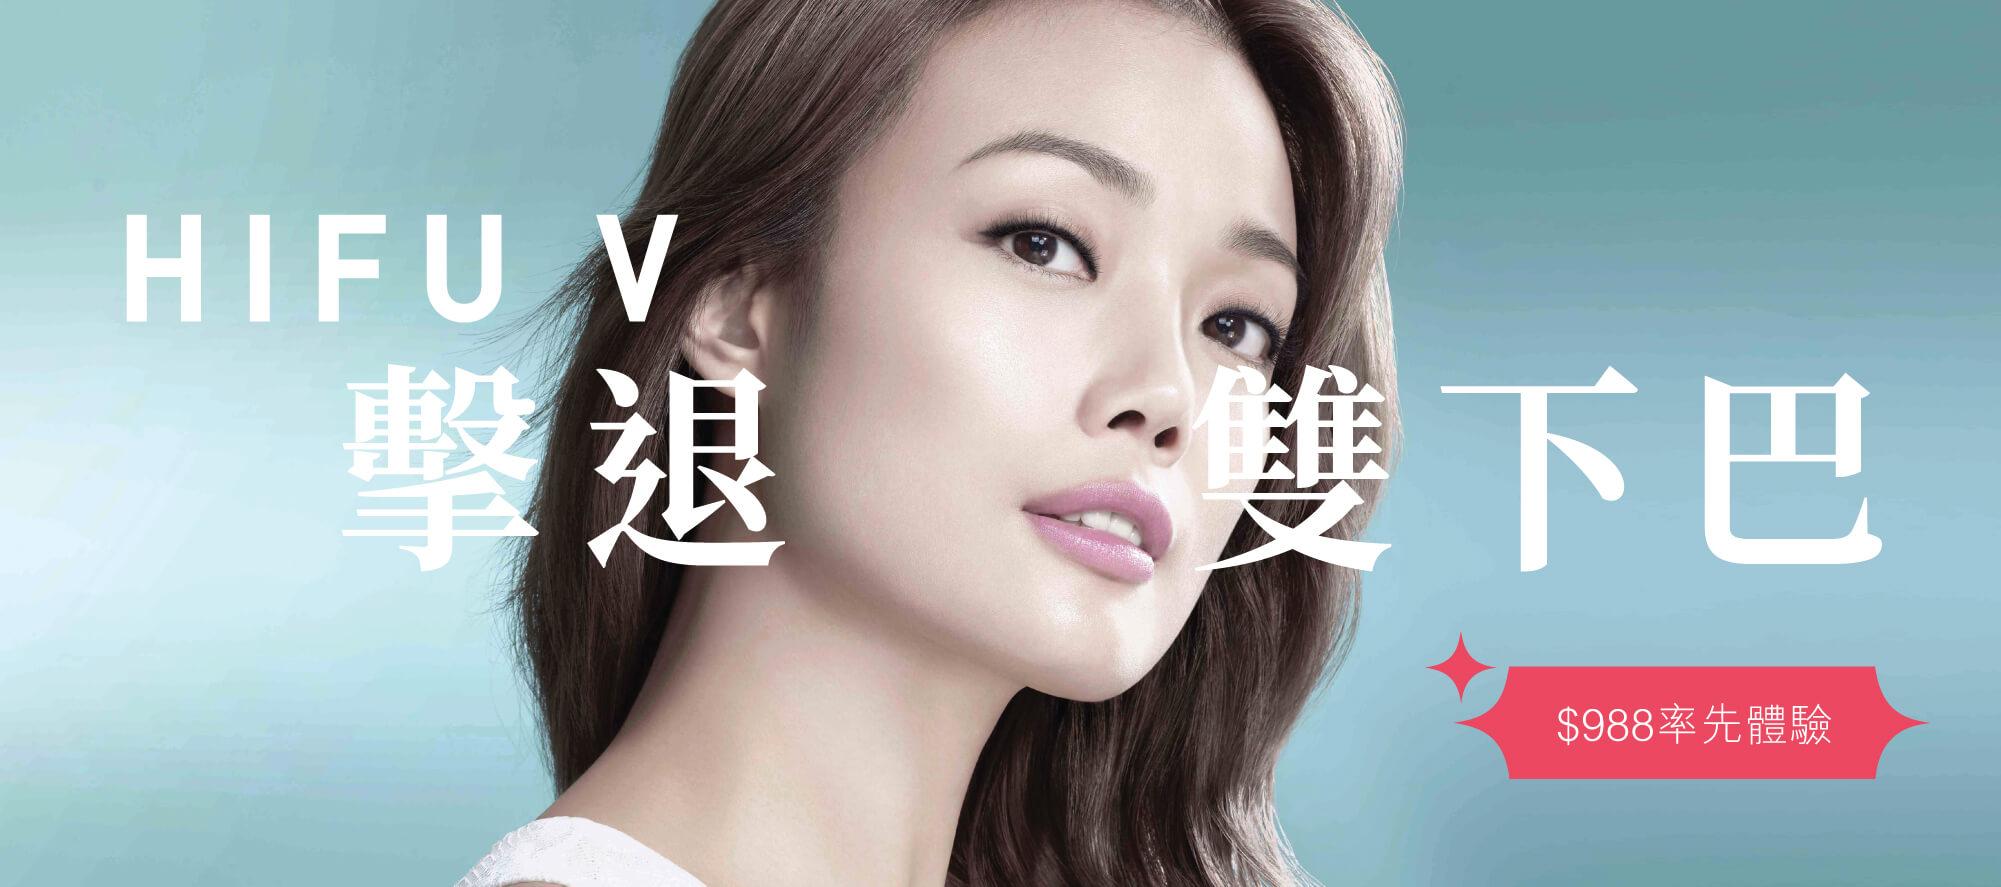 HIFU-V 緊膚 雙下巴 提拉 V面